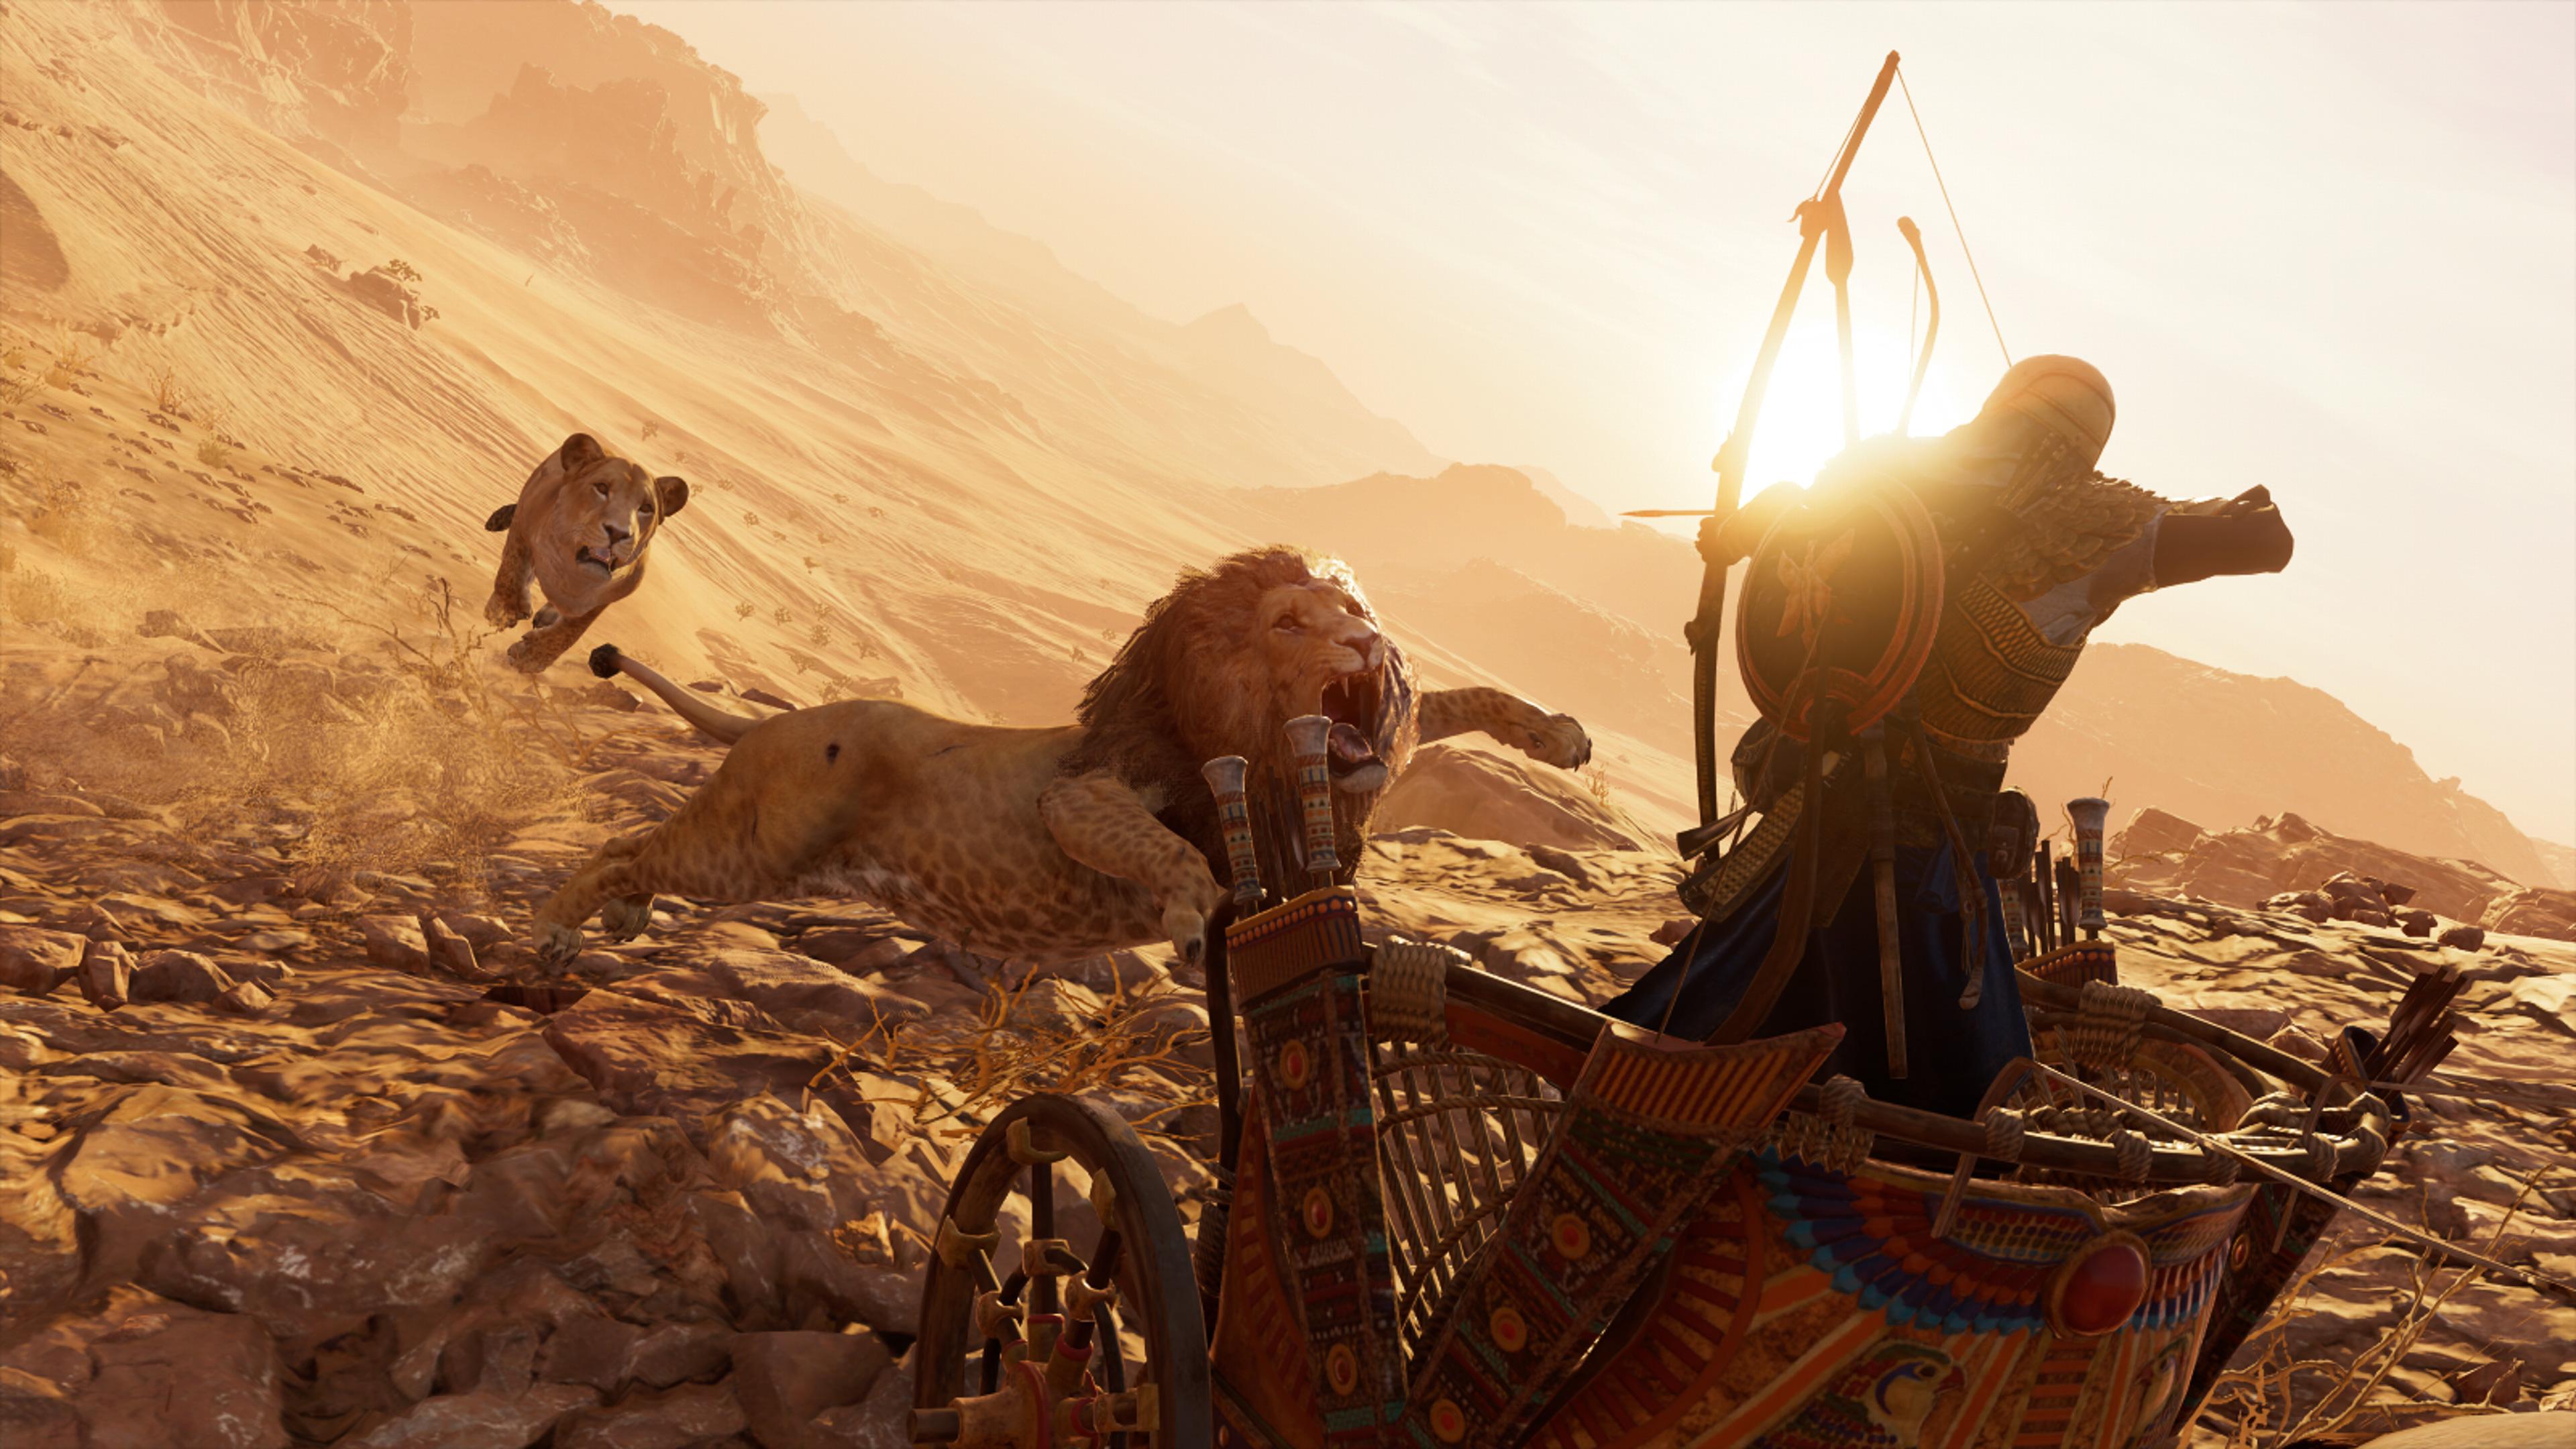 2048x2048 Lions Assassins Creed Origins 4k Ipad Air Hd 4k